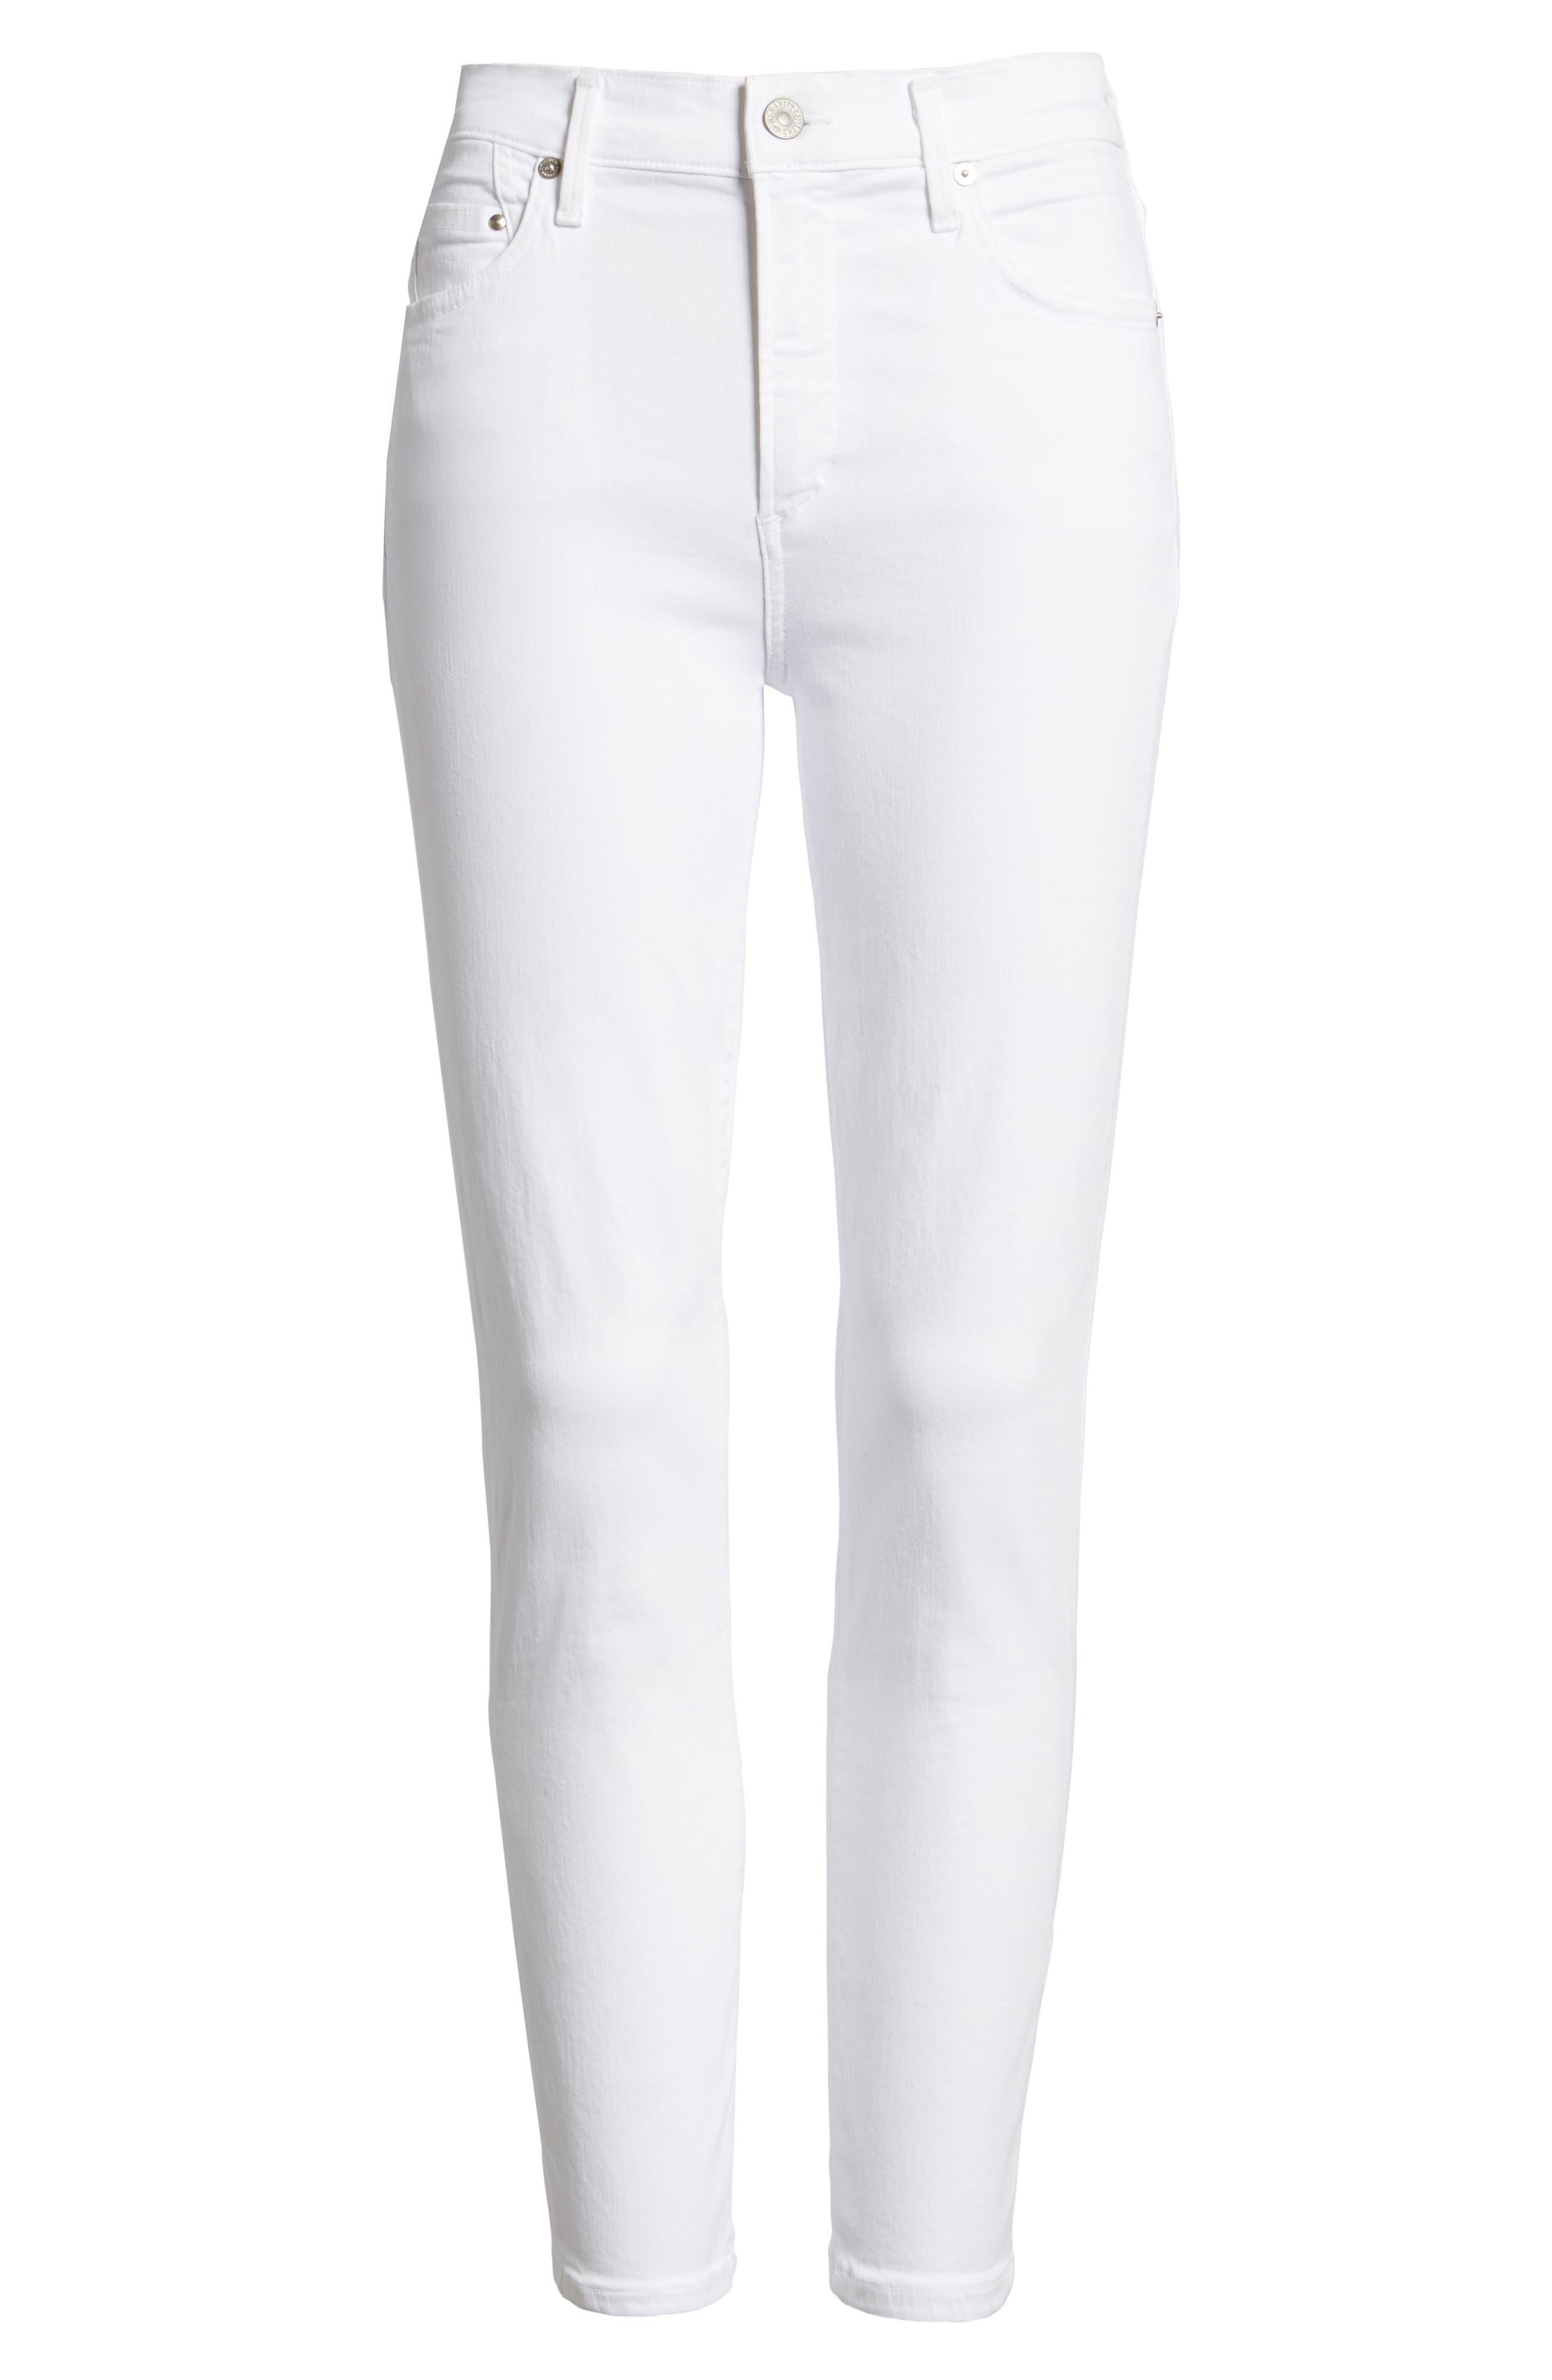 Rocket High Waist Crop Skinny Jeans,                             Alternate thumbnail 2, color,                             SCULPT WHITE